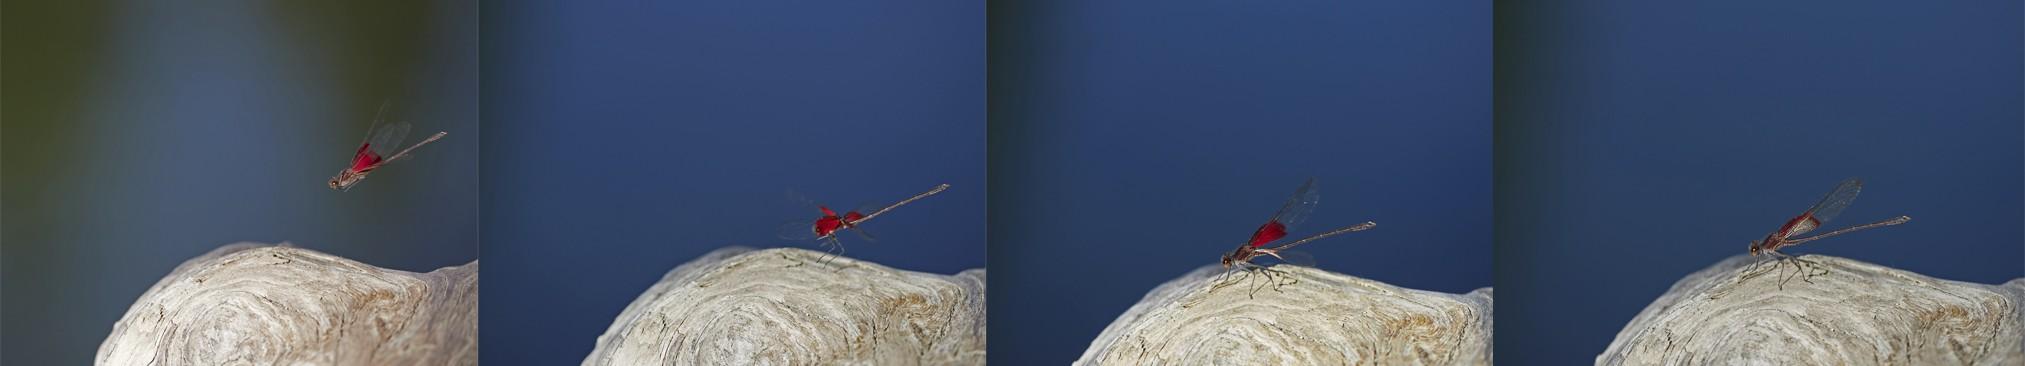 American rubyspot sticks the landing. - PHOTO BY ANTHONY WESTKAMPER